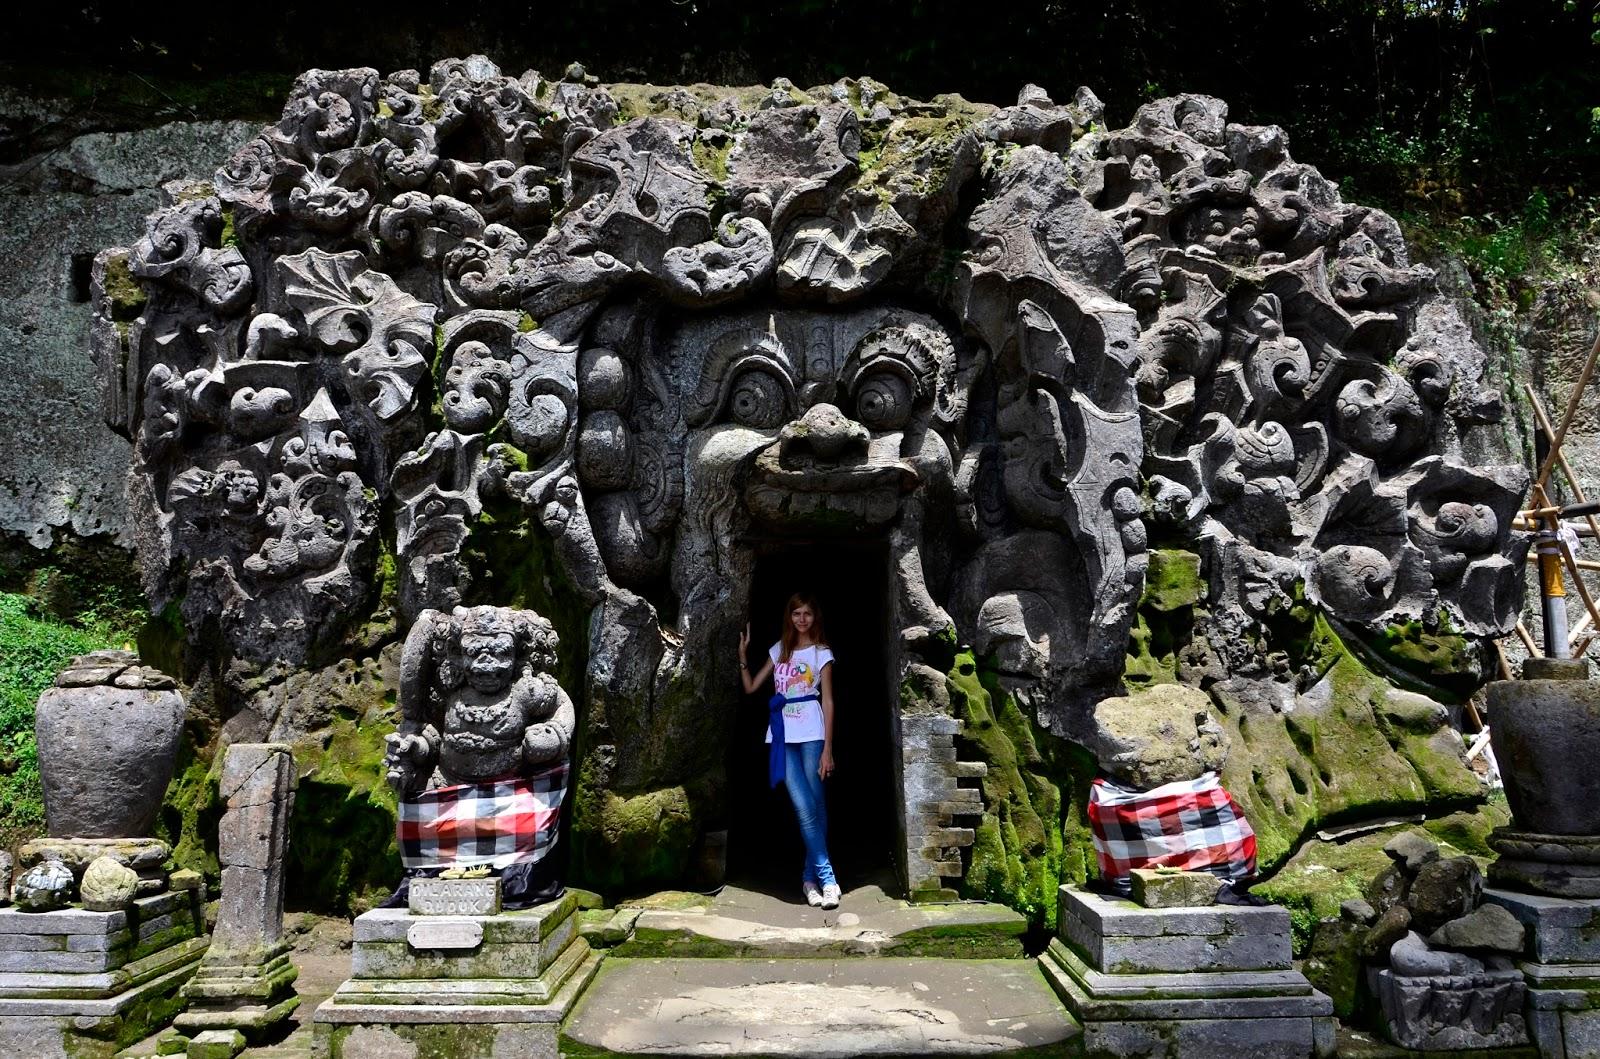 Goa Gadzha Gajah Slonovya Peshera Dzhungli Na Bali Datiruetsya Ix